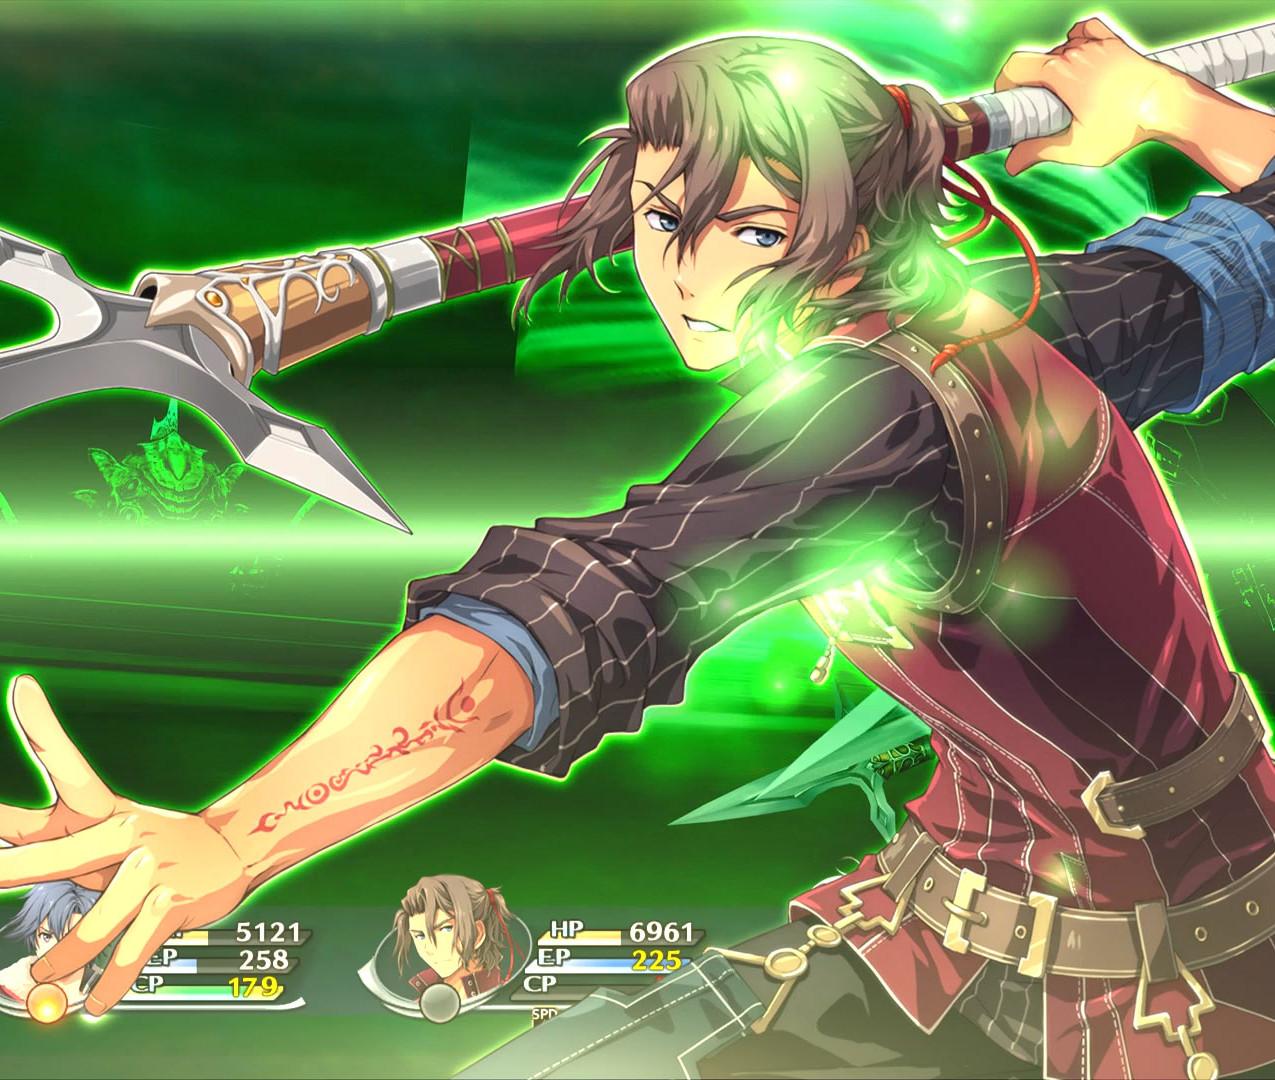 CSII_PS4_Battle_5